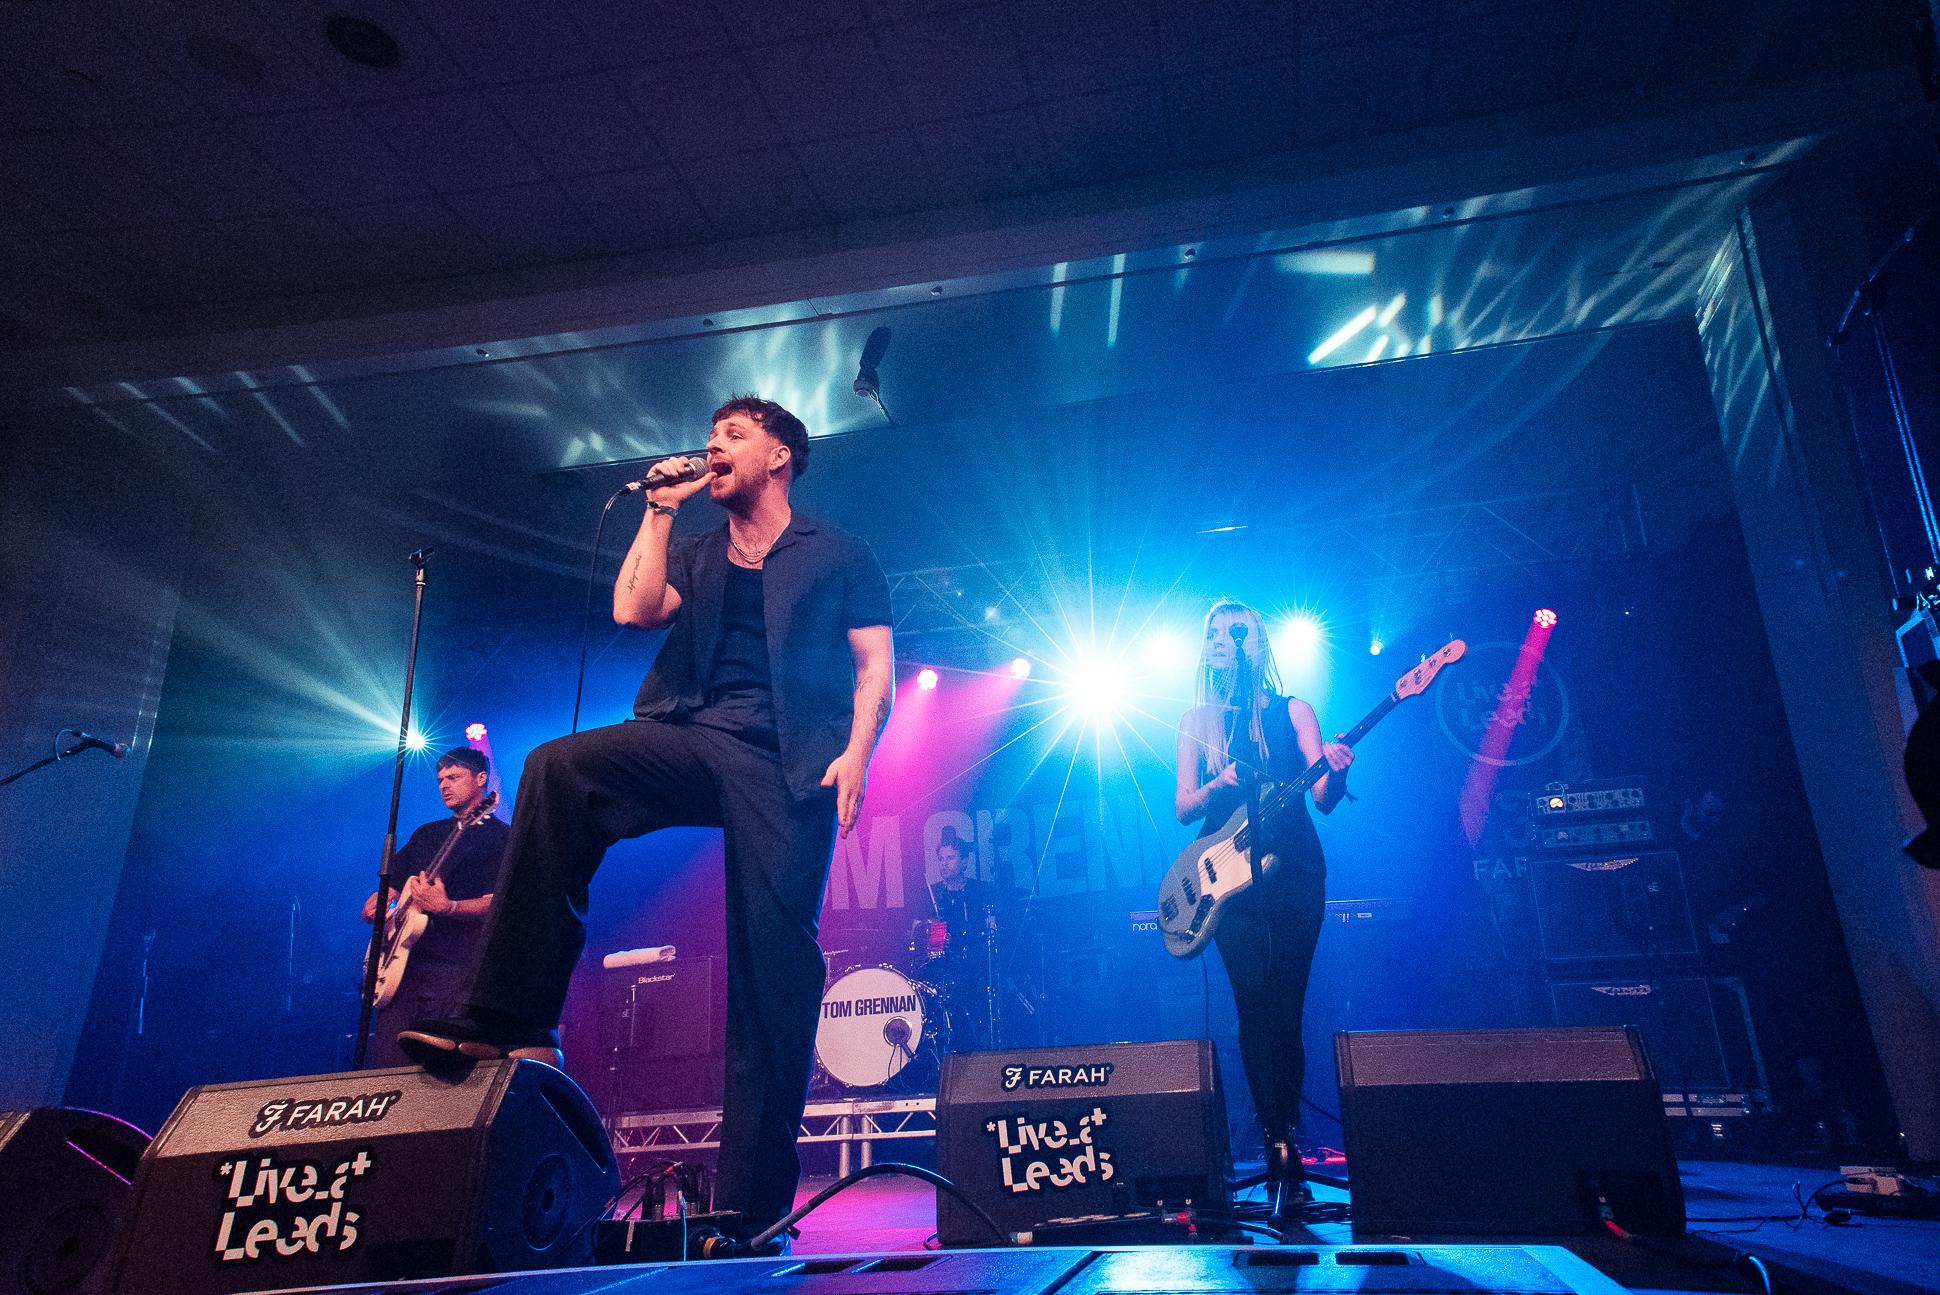 Live At Leeds 2019 - Tom Grennan_-6.jpg